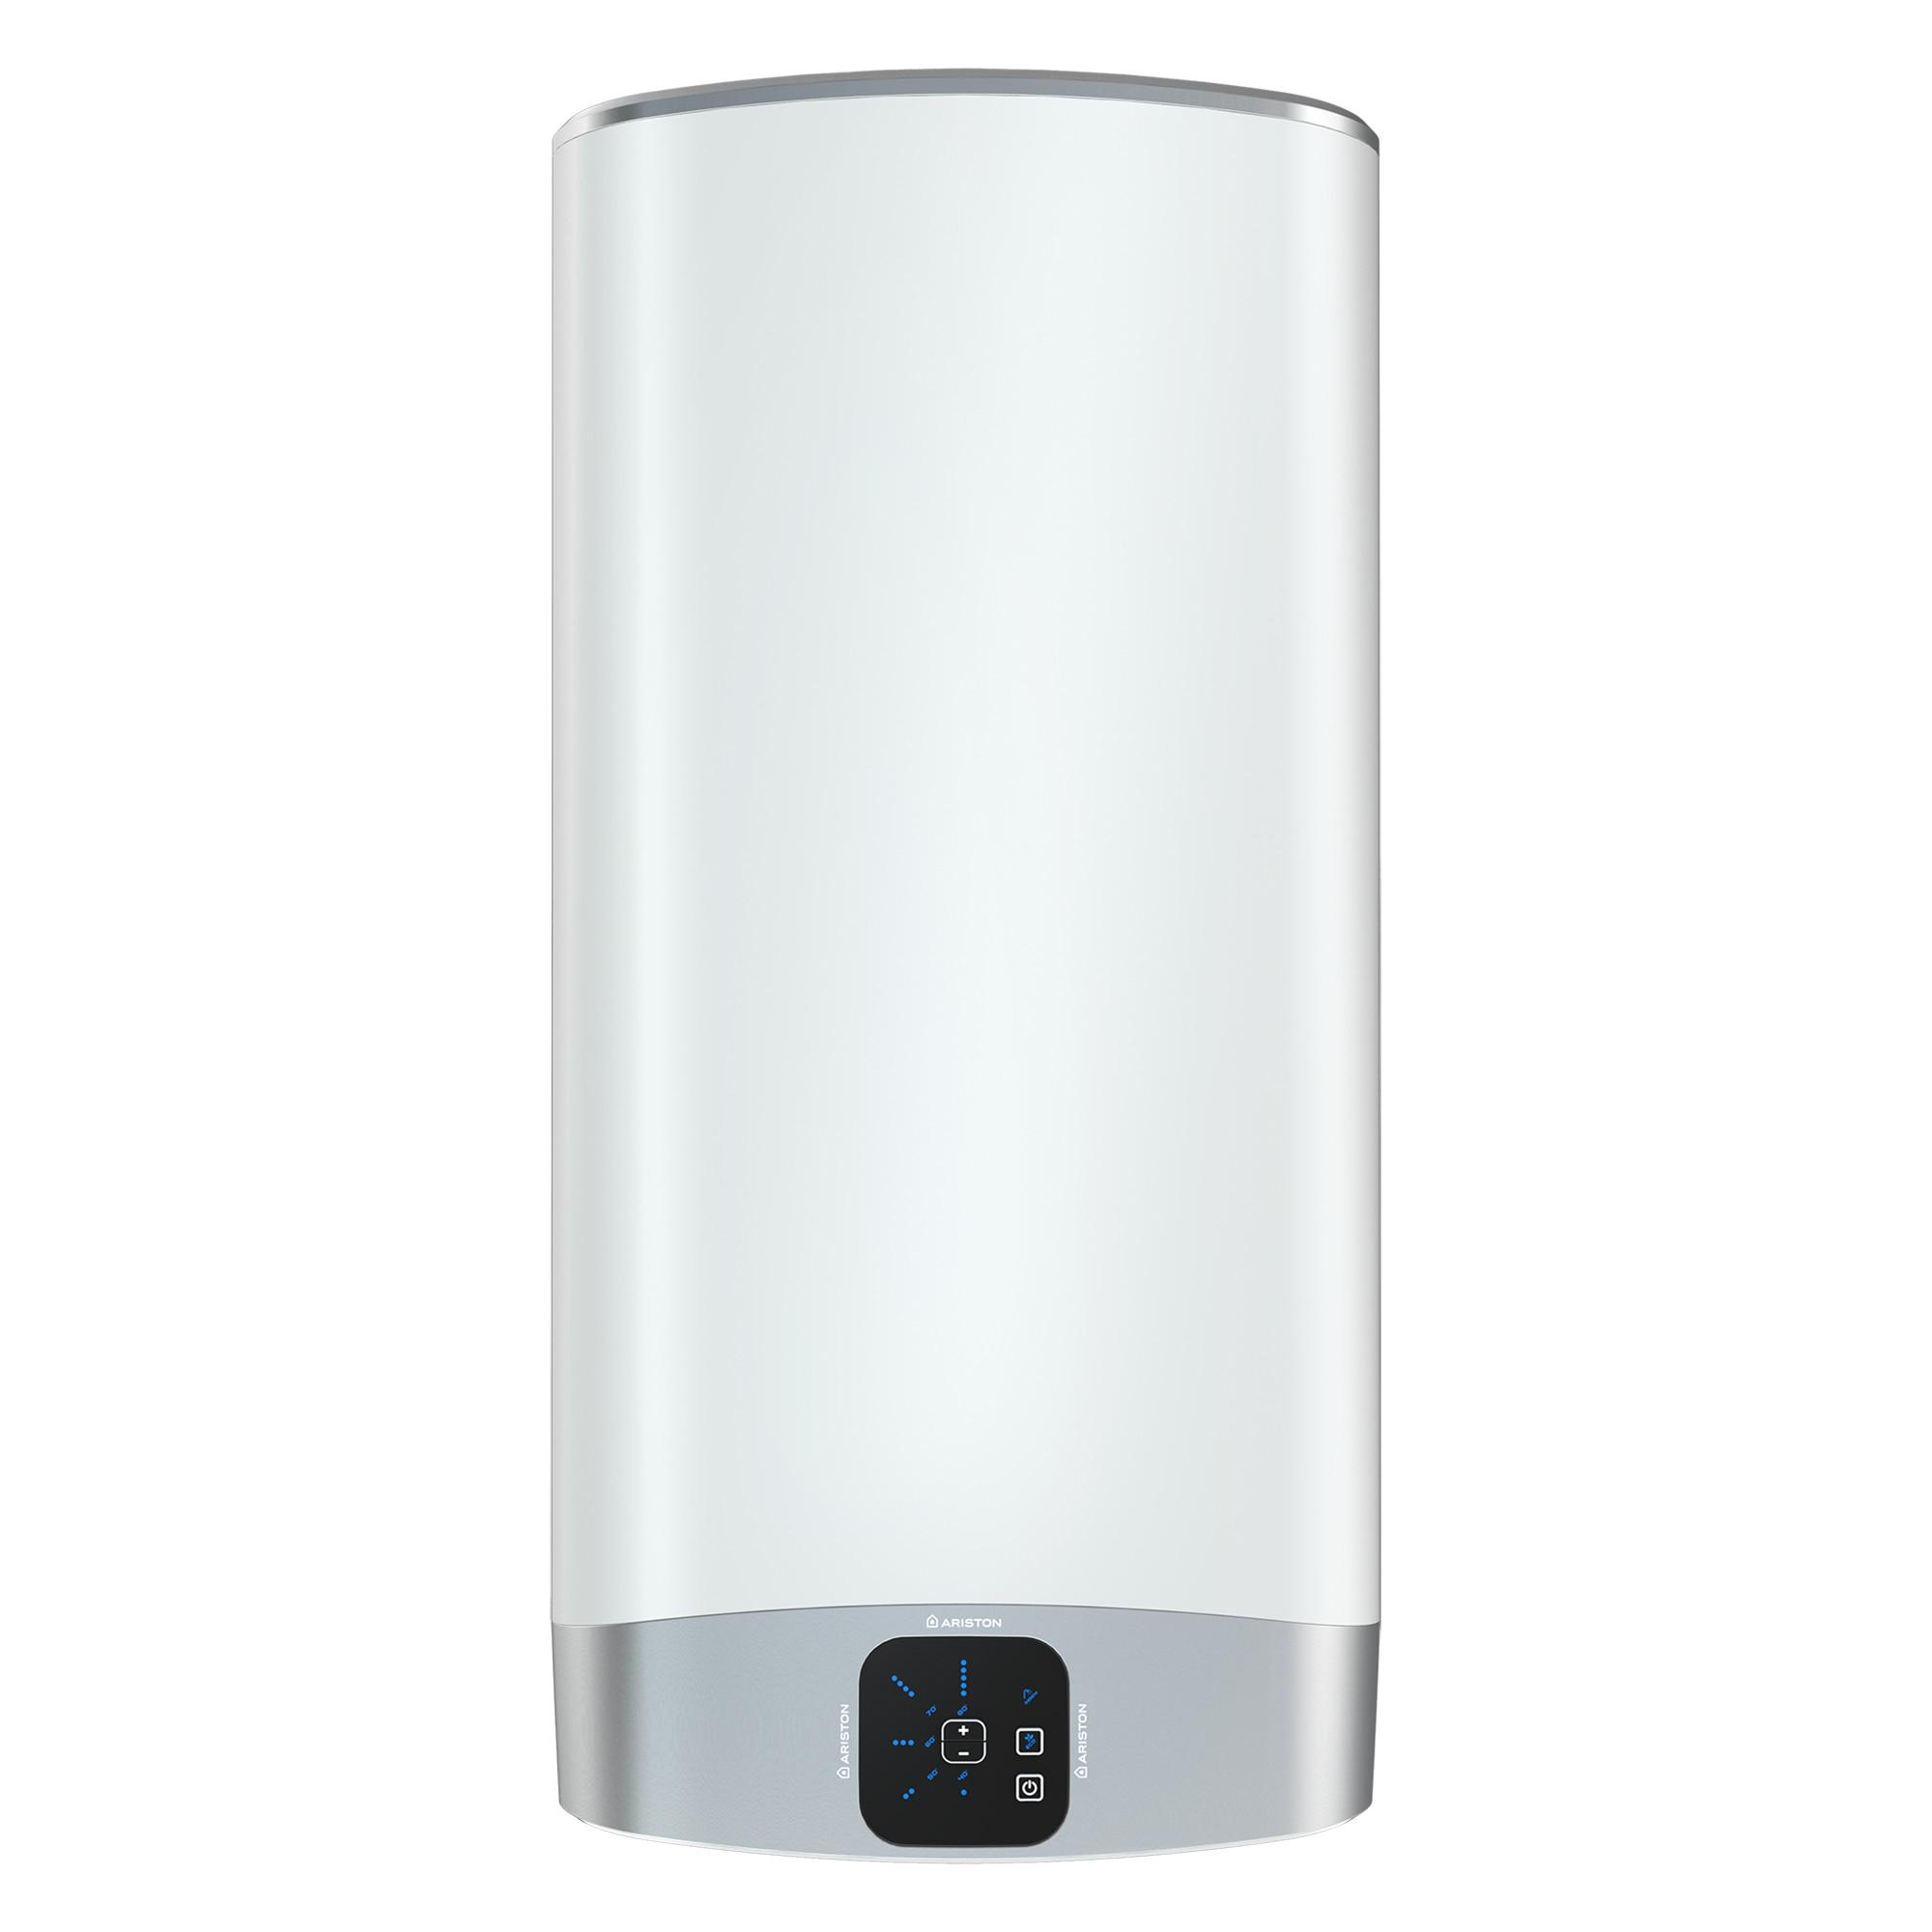 Fotografie Boiler electric Ariston Velis Evo 80 EU, 2 x 1500 W, 80 l, 0.8 Mpa, Functie ECO EVO, Izolatie termica, Doua rezervoare, Protectie electrica IPX4, Instalare V/O